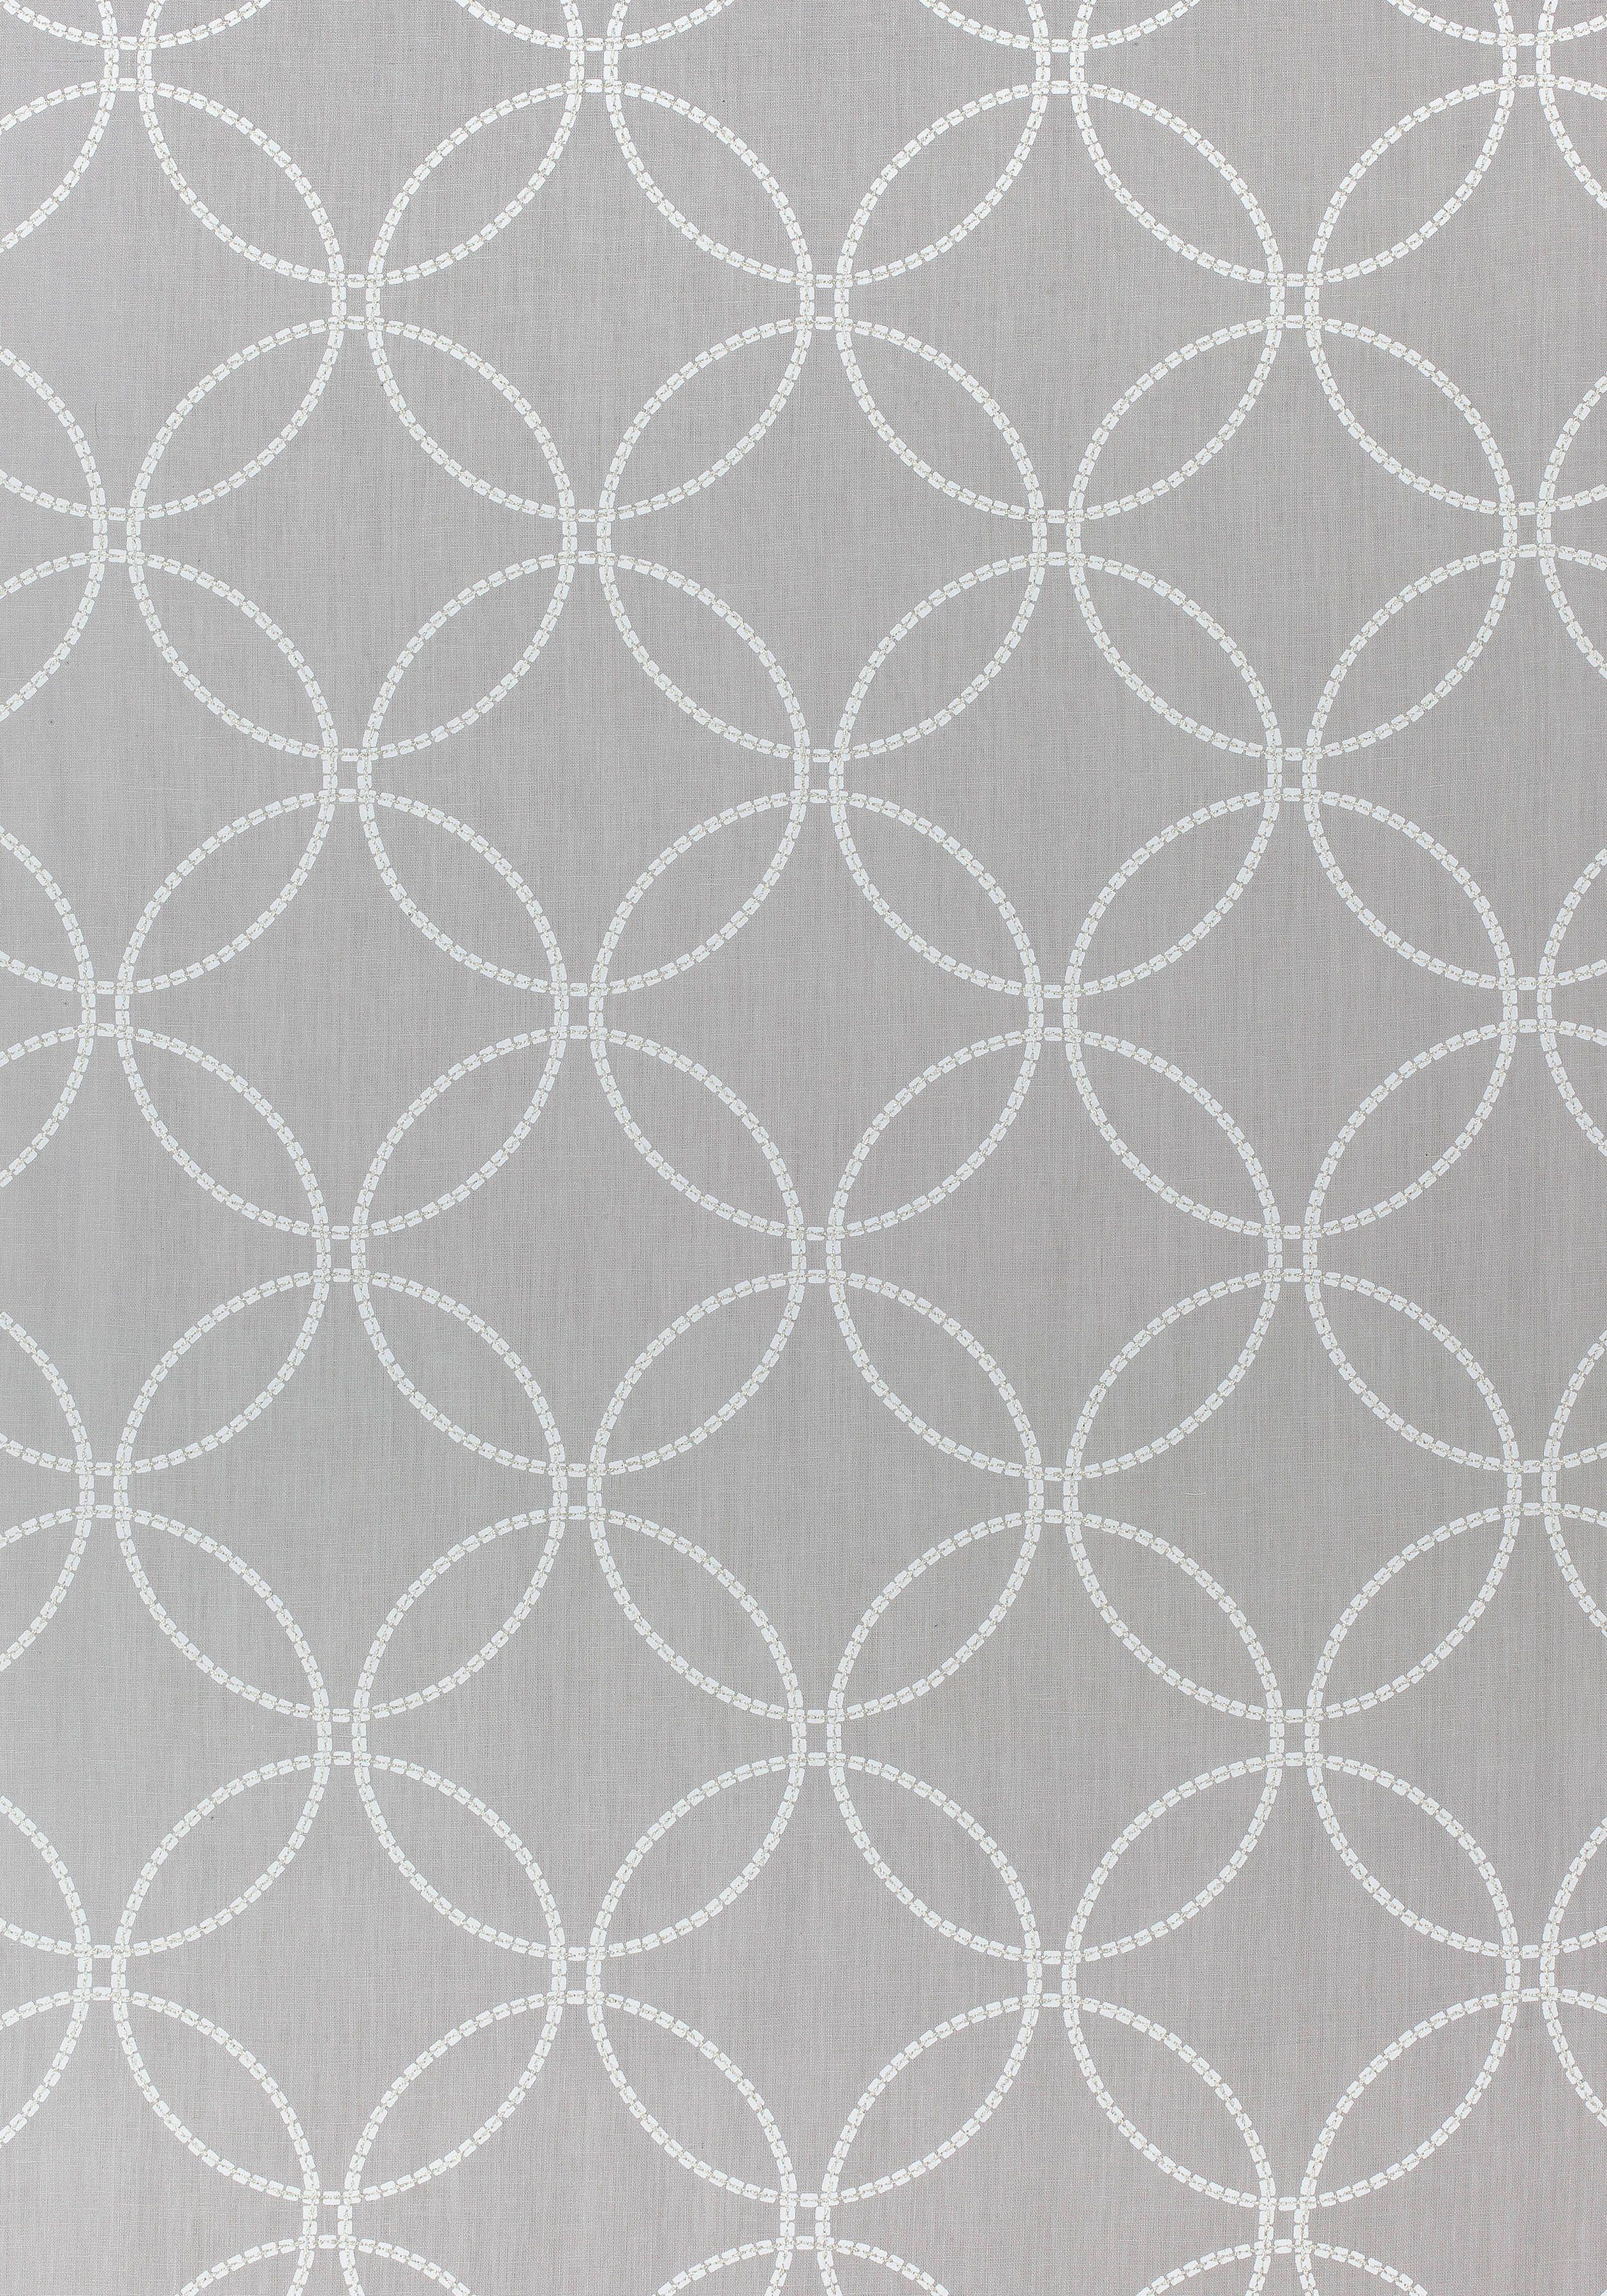 Aw9118 Living Room Wallpaper Texture Wallpaper Accent